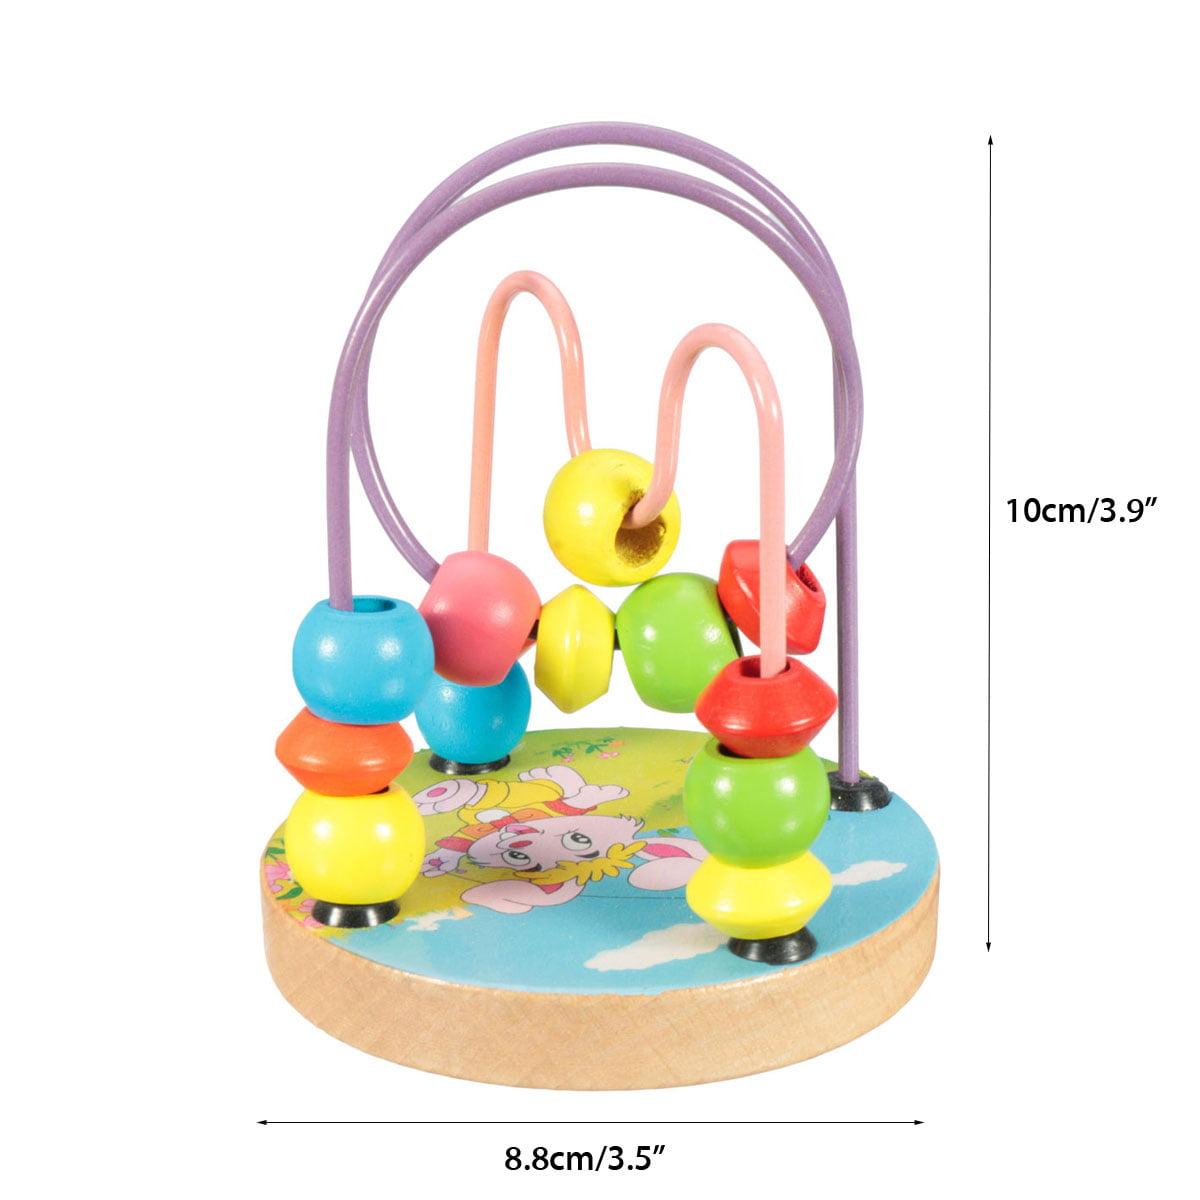 1Pc Baby aroundbead Kids Wooden Mini Around Beads Infant Intelligence Educational Game Toy Random Delivery